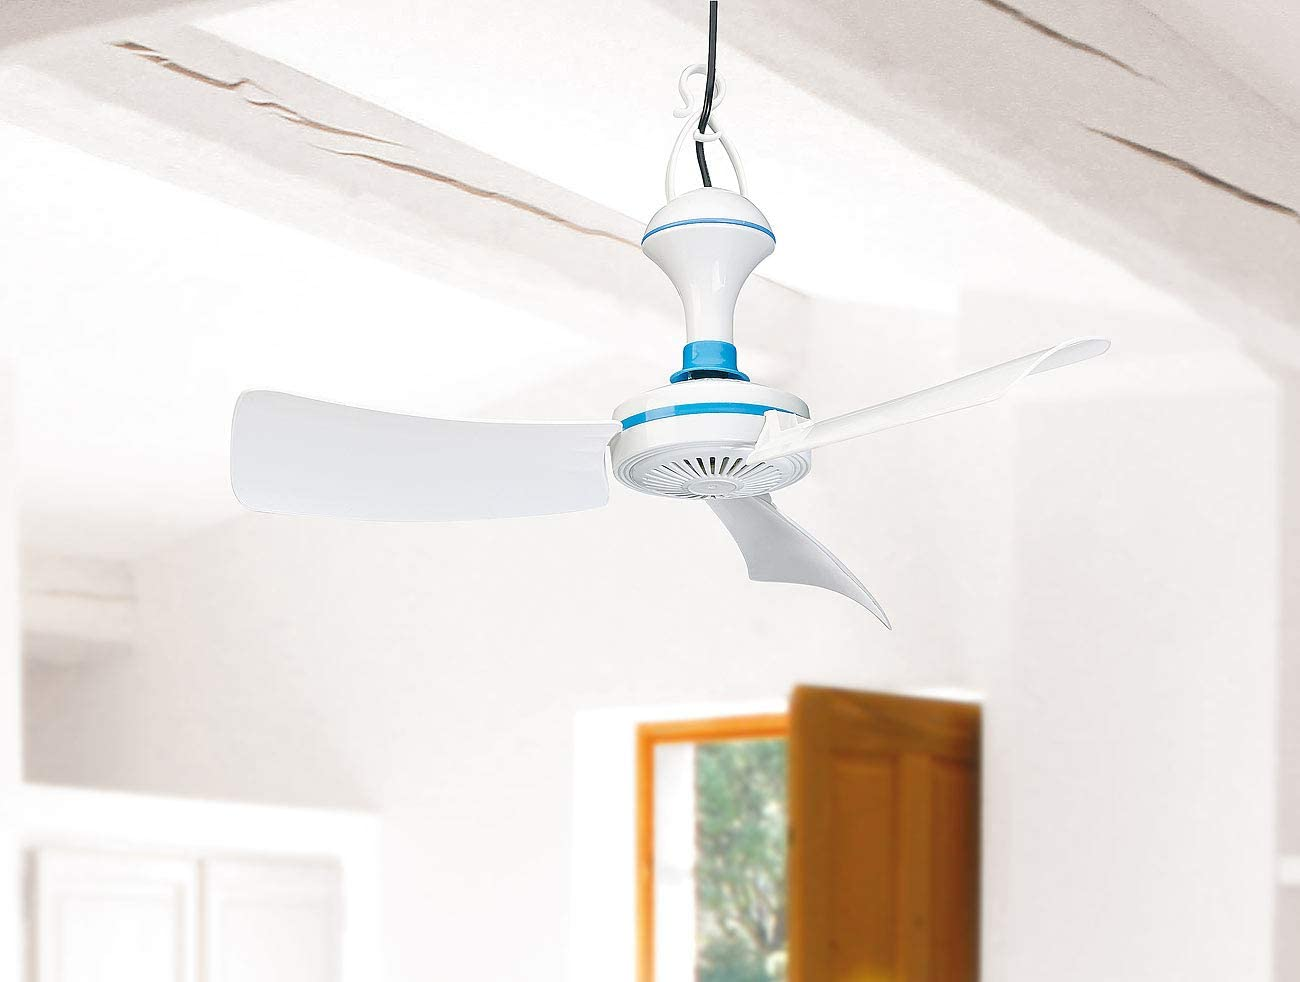 Elektrischer Ventilator PEARL Mobiler Ventilator: Mobiler USB-Deckenventilator mit Aufh/änger 300 U//Min. /Ø 42 cm 5 W